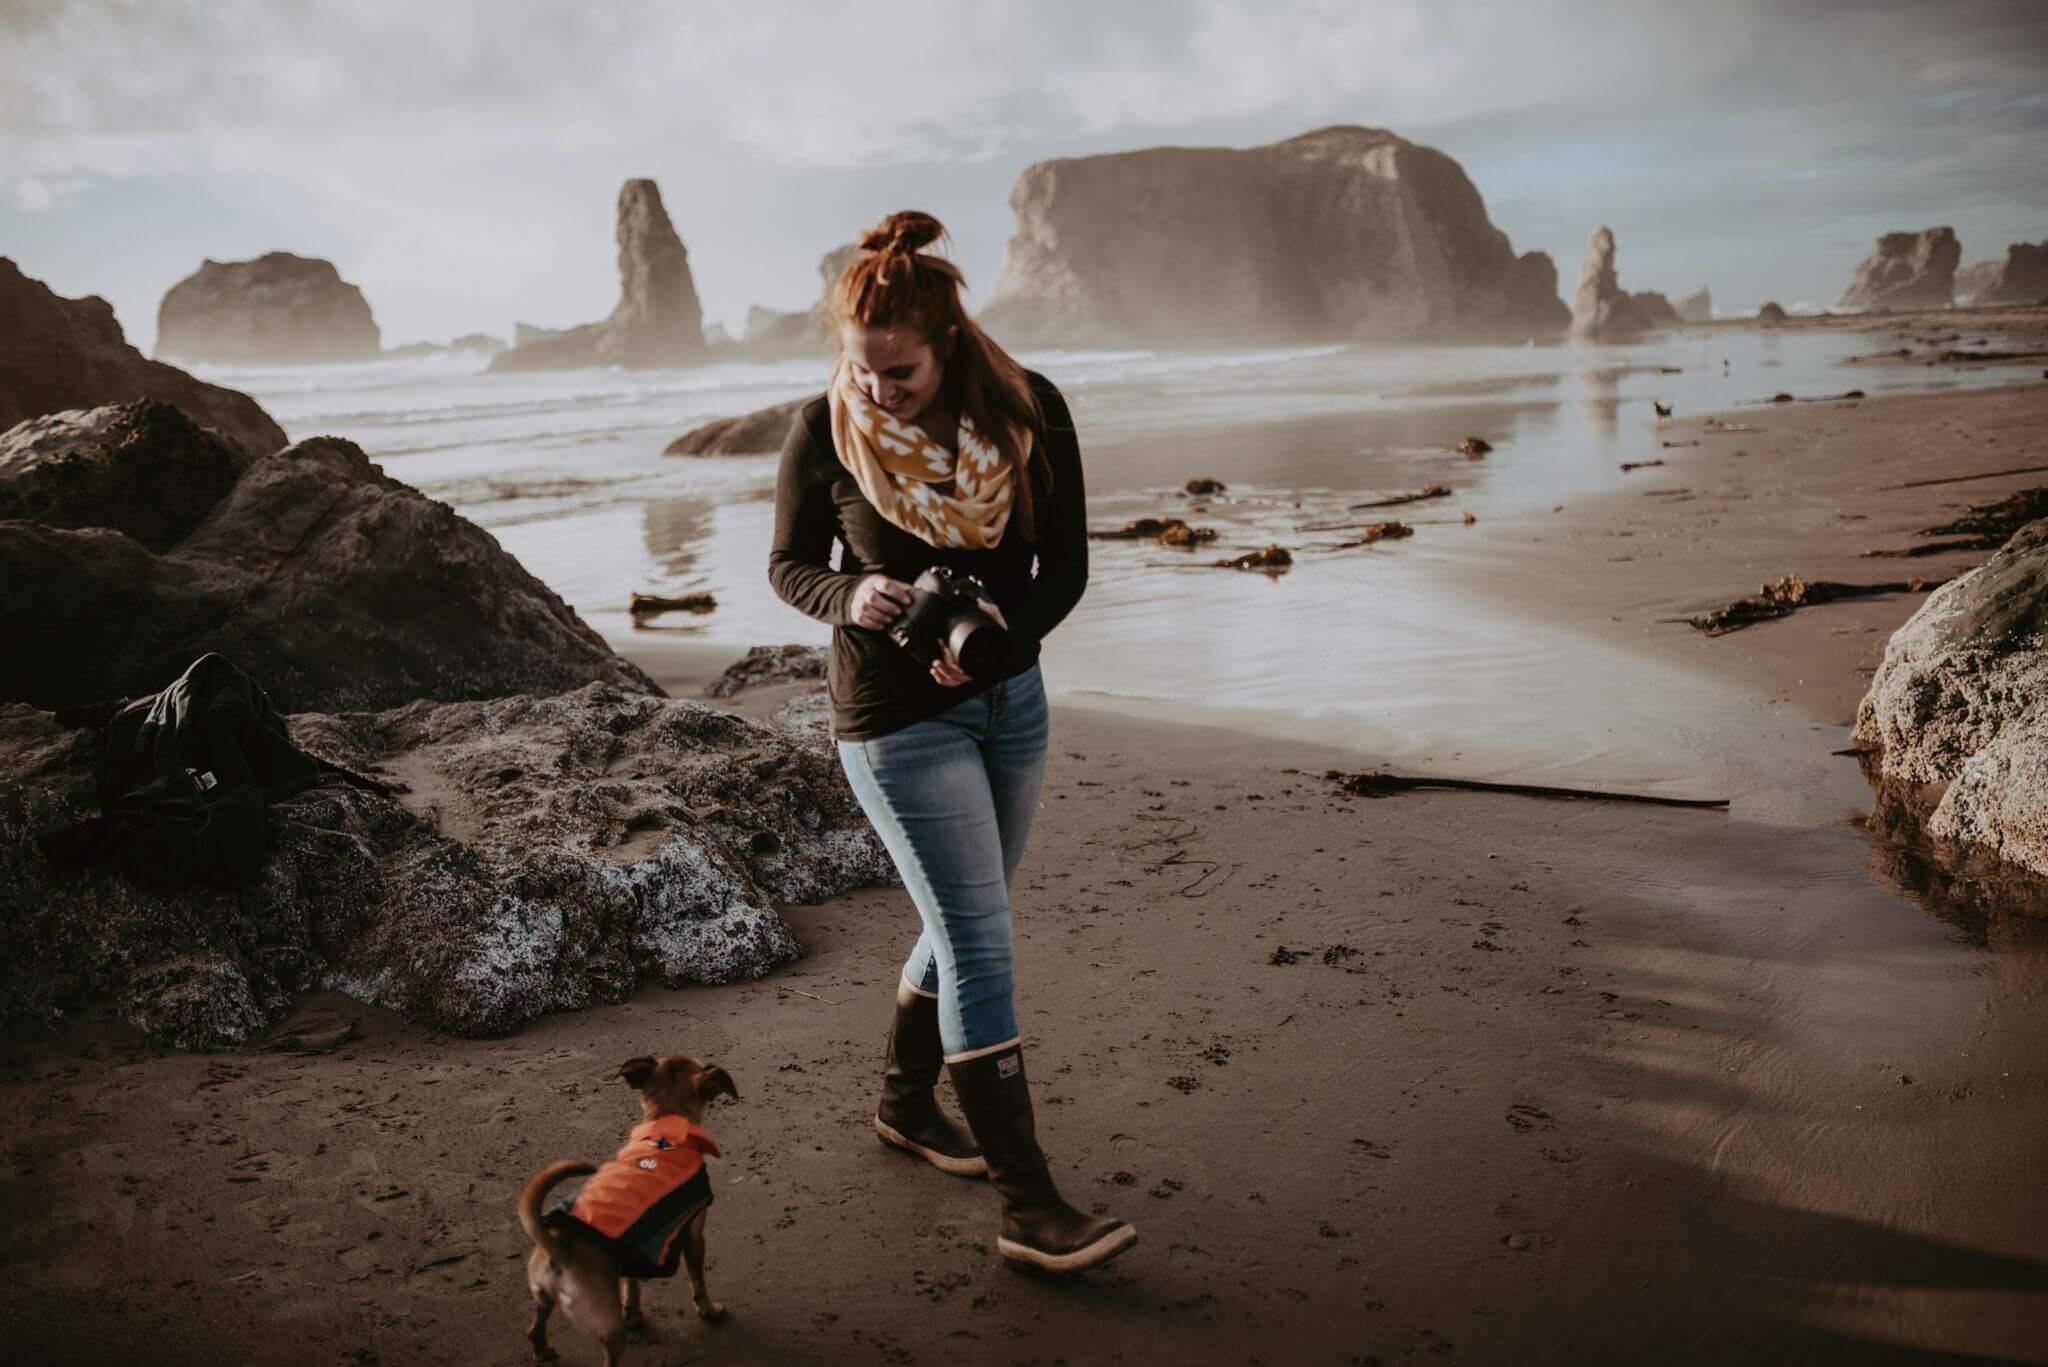 Adventure Elopement Photographer - Oregon, California, Montana, Colorado, Utah, Washington and beyond.